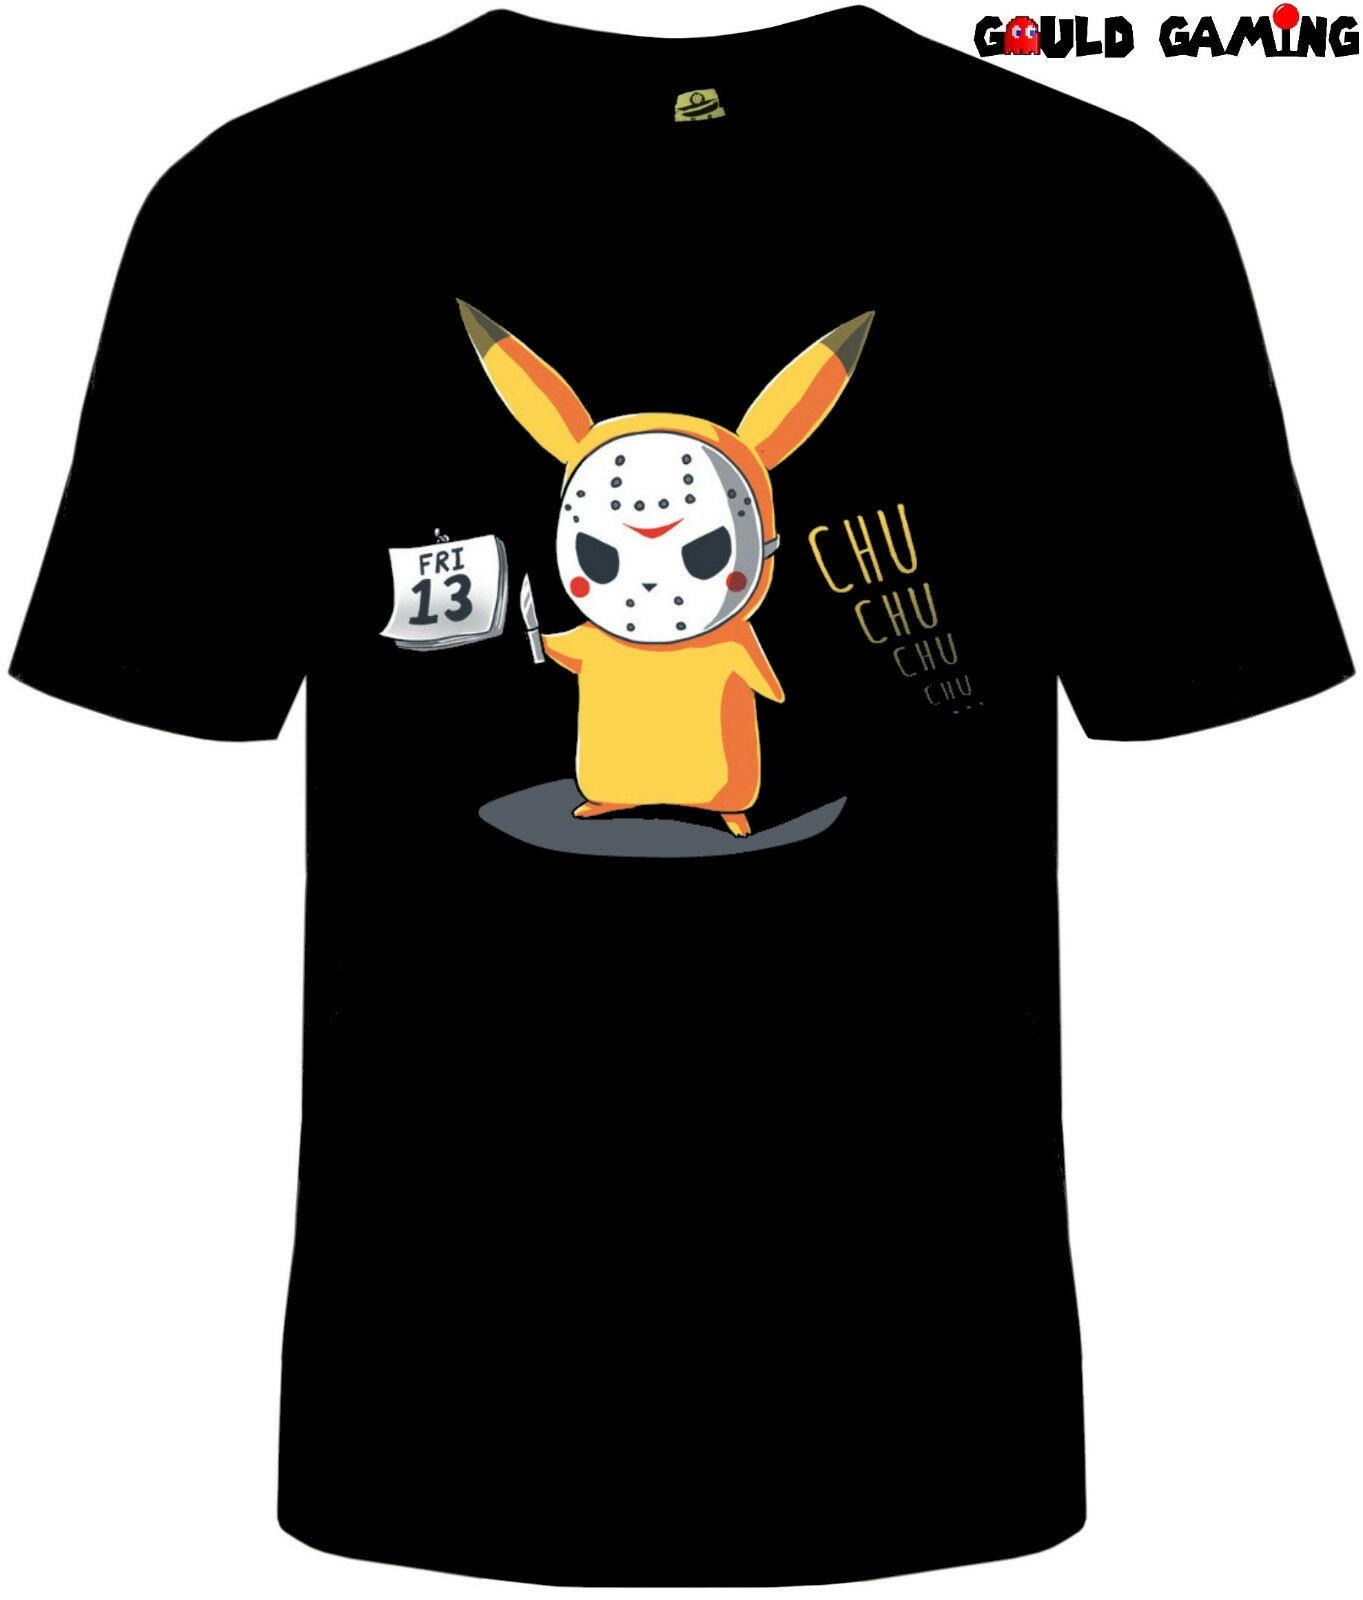 Viernes 13 camiseta Unisex adultos Horror Pikachu Pokemon Halloween tamaños nuevos